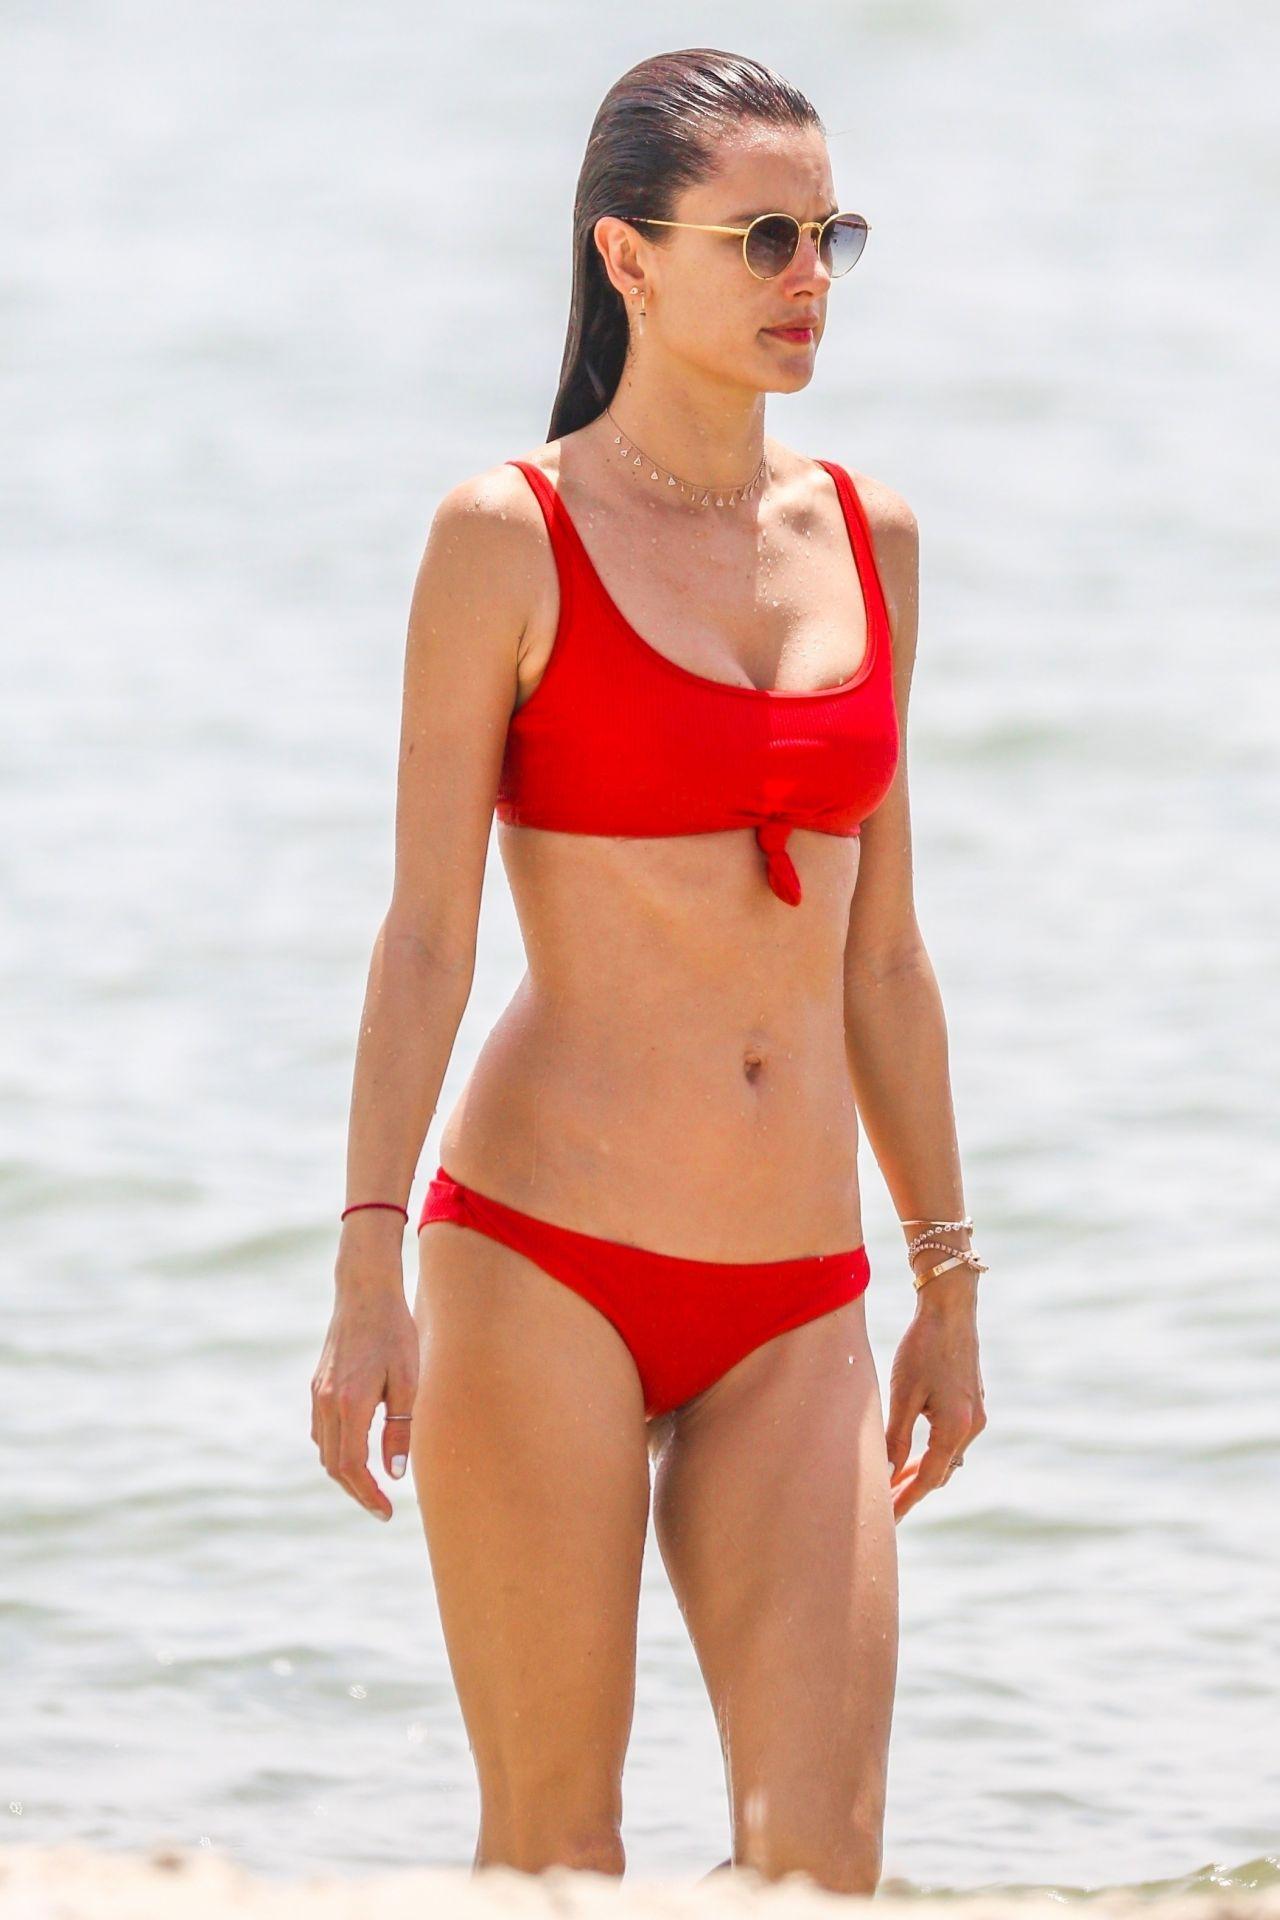 Alessandra Ambrosio in Red Bikini on the beach in Florianopolis Pic 2 of 35